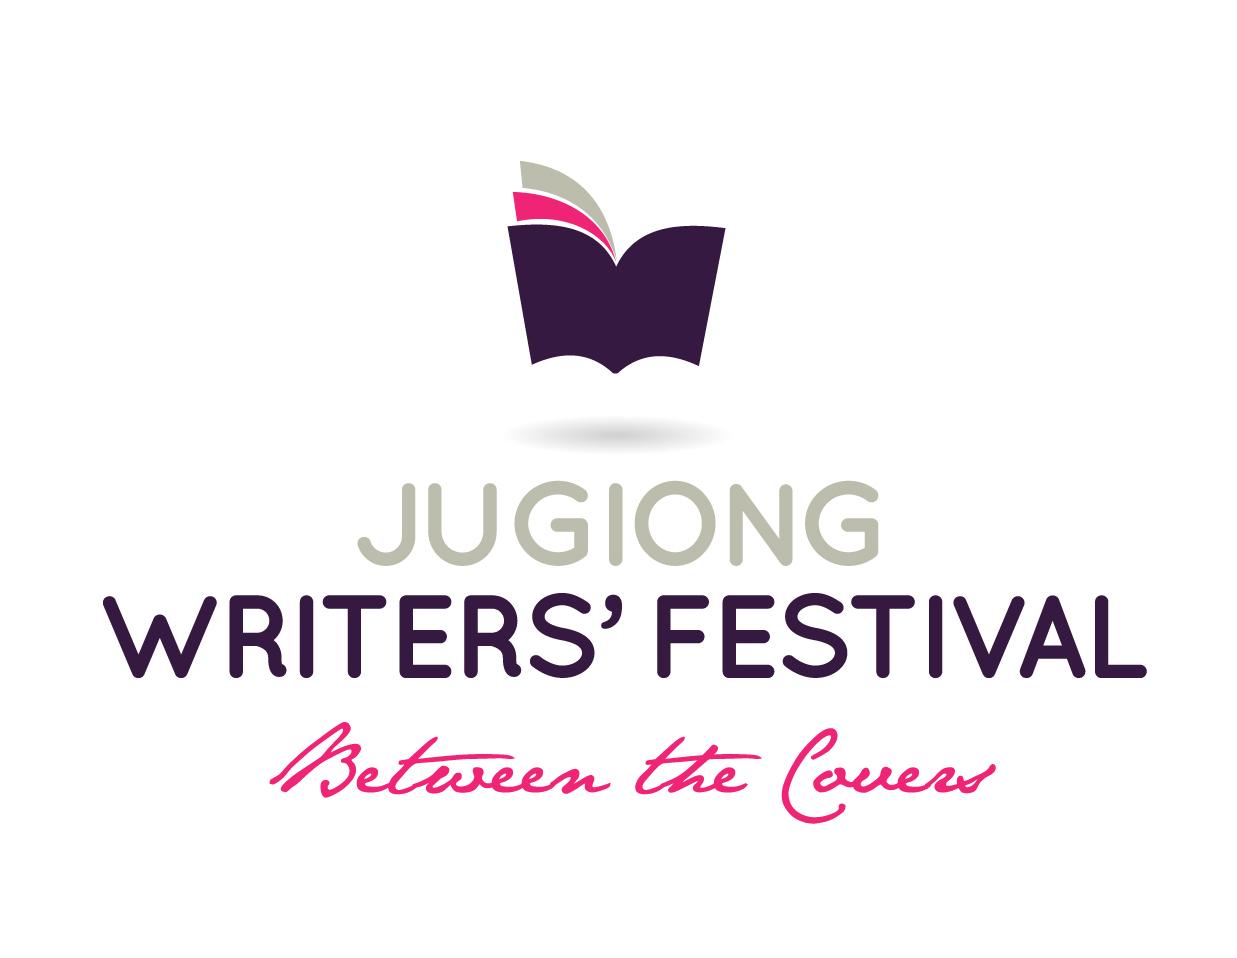 Jogiong Writers Festival Logo